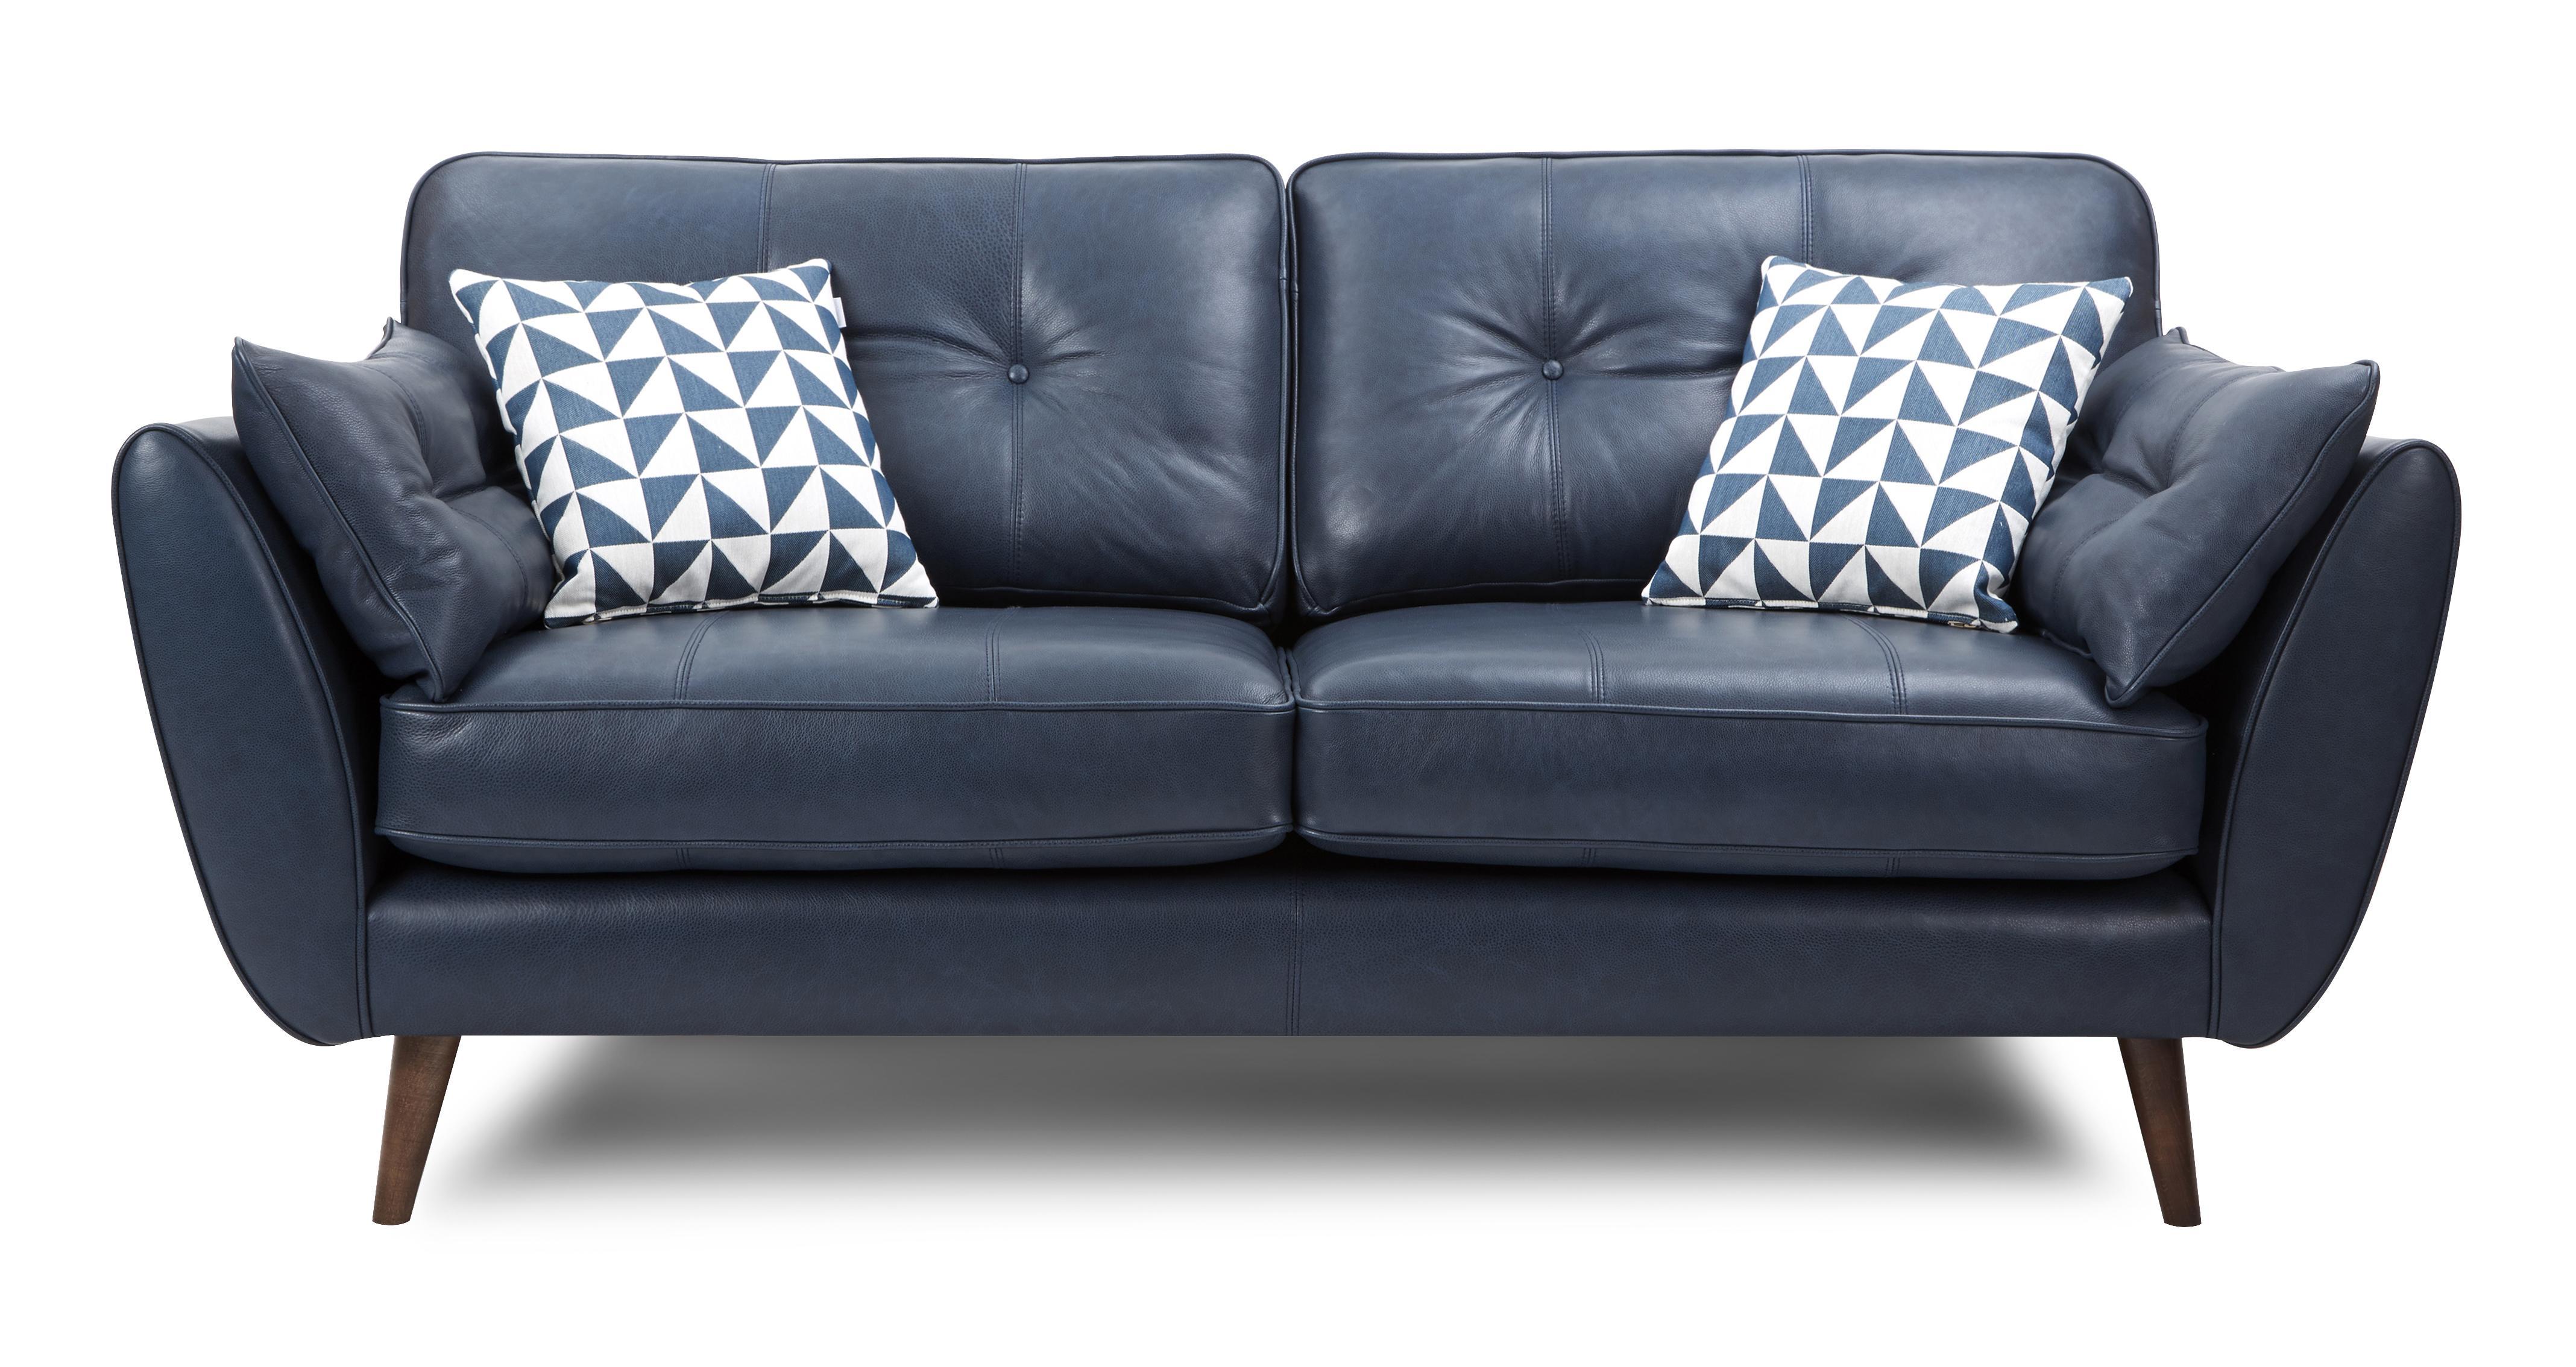 Sofa Express Brae Glamorous Cheap White Leather Sectional Sofa